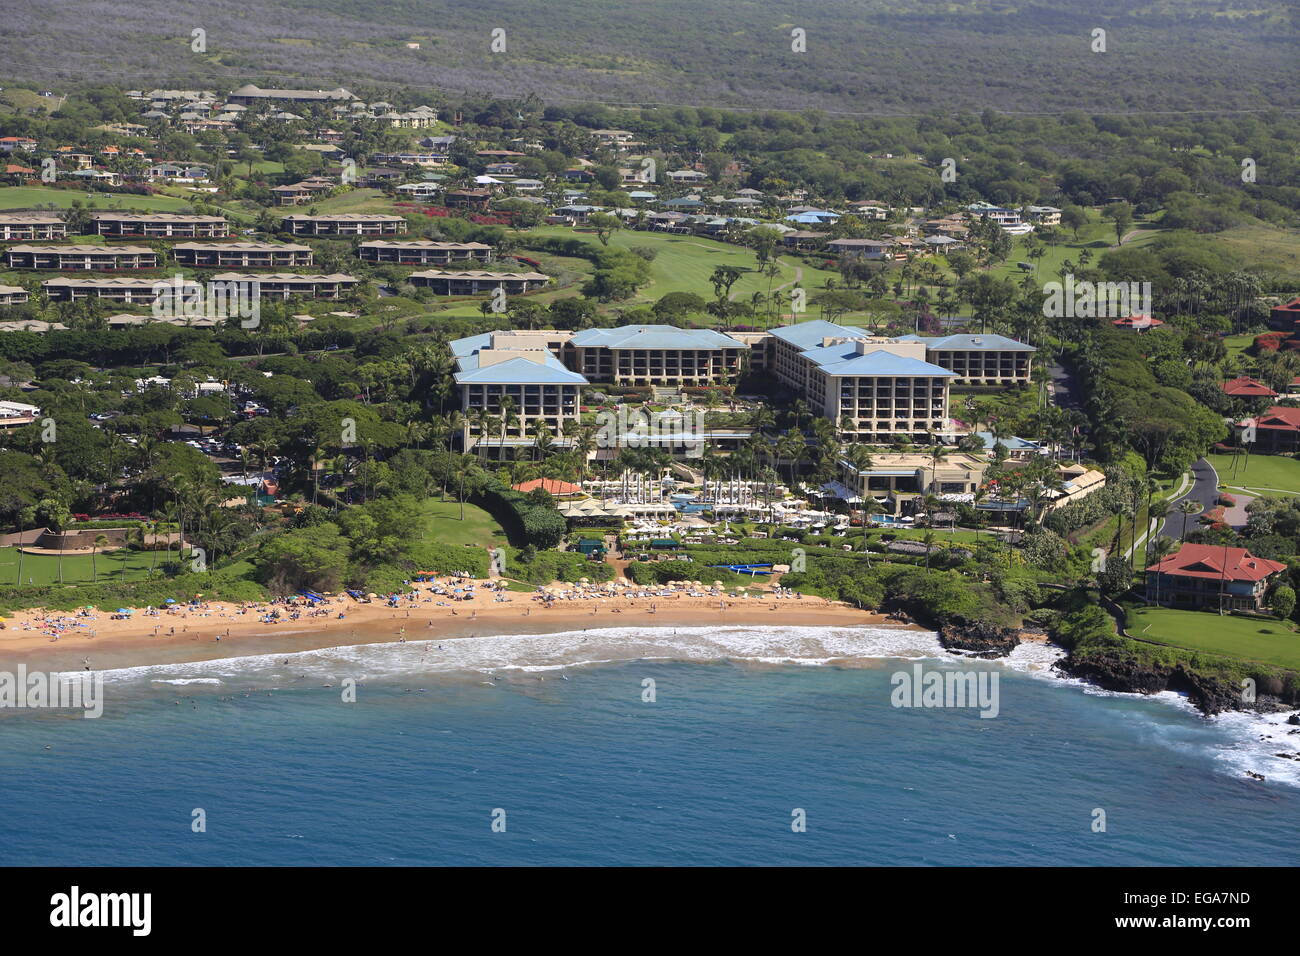 Four Seasons, Wailua Beach and Resort, Maui, Hawaii - Stock Image